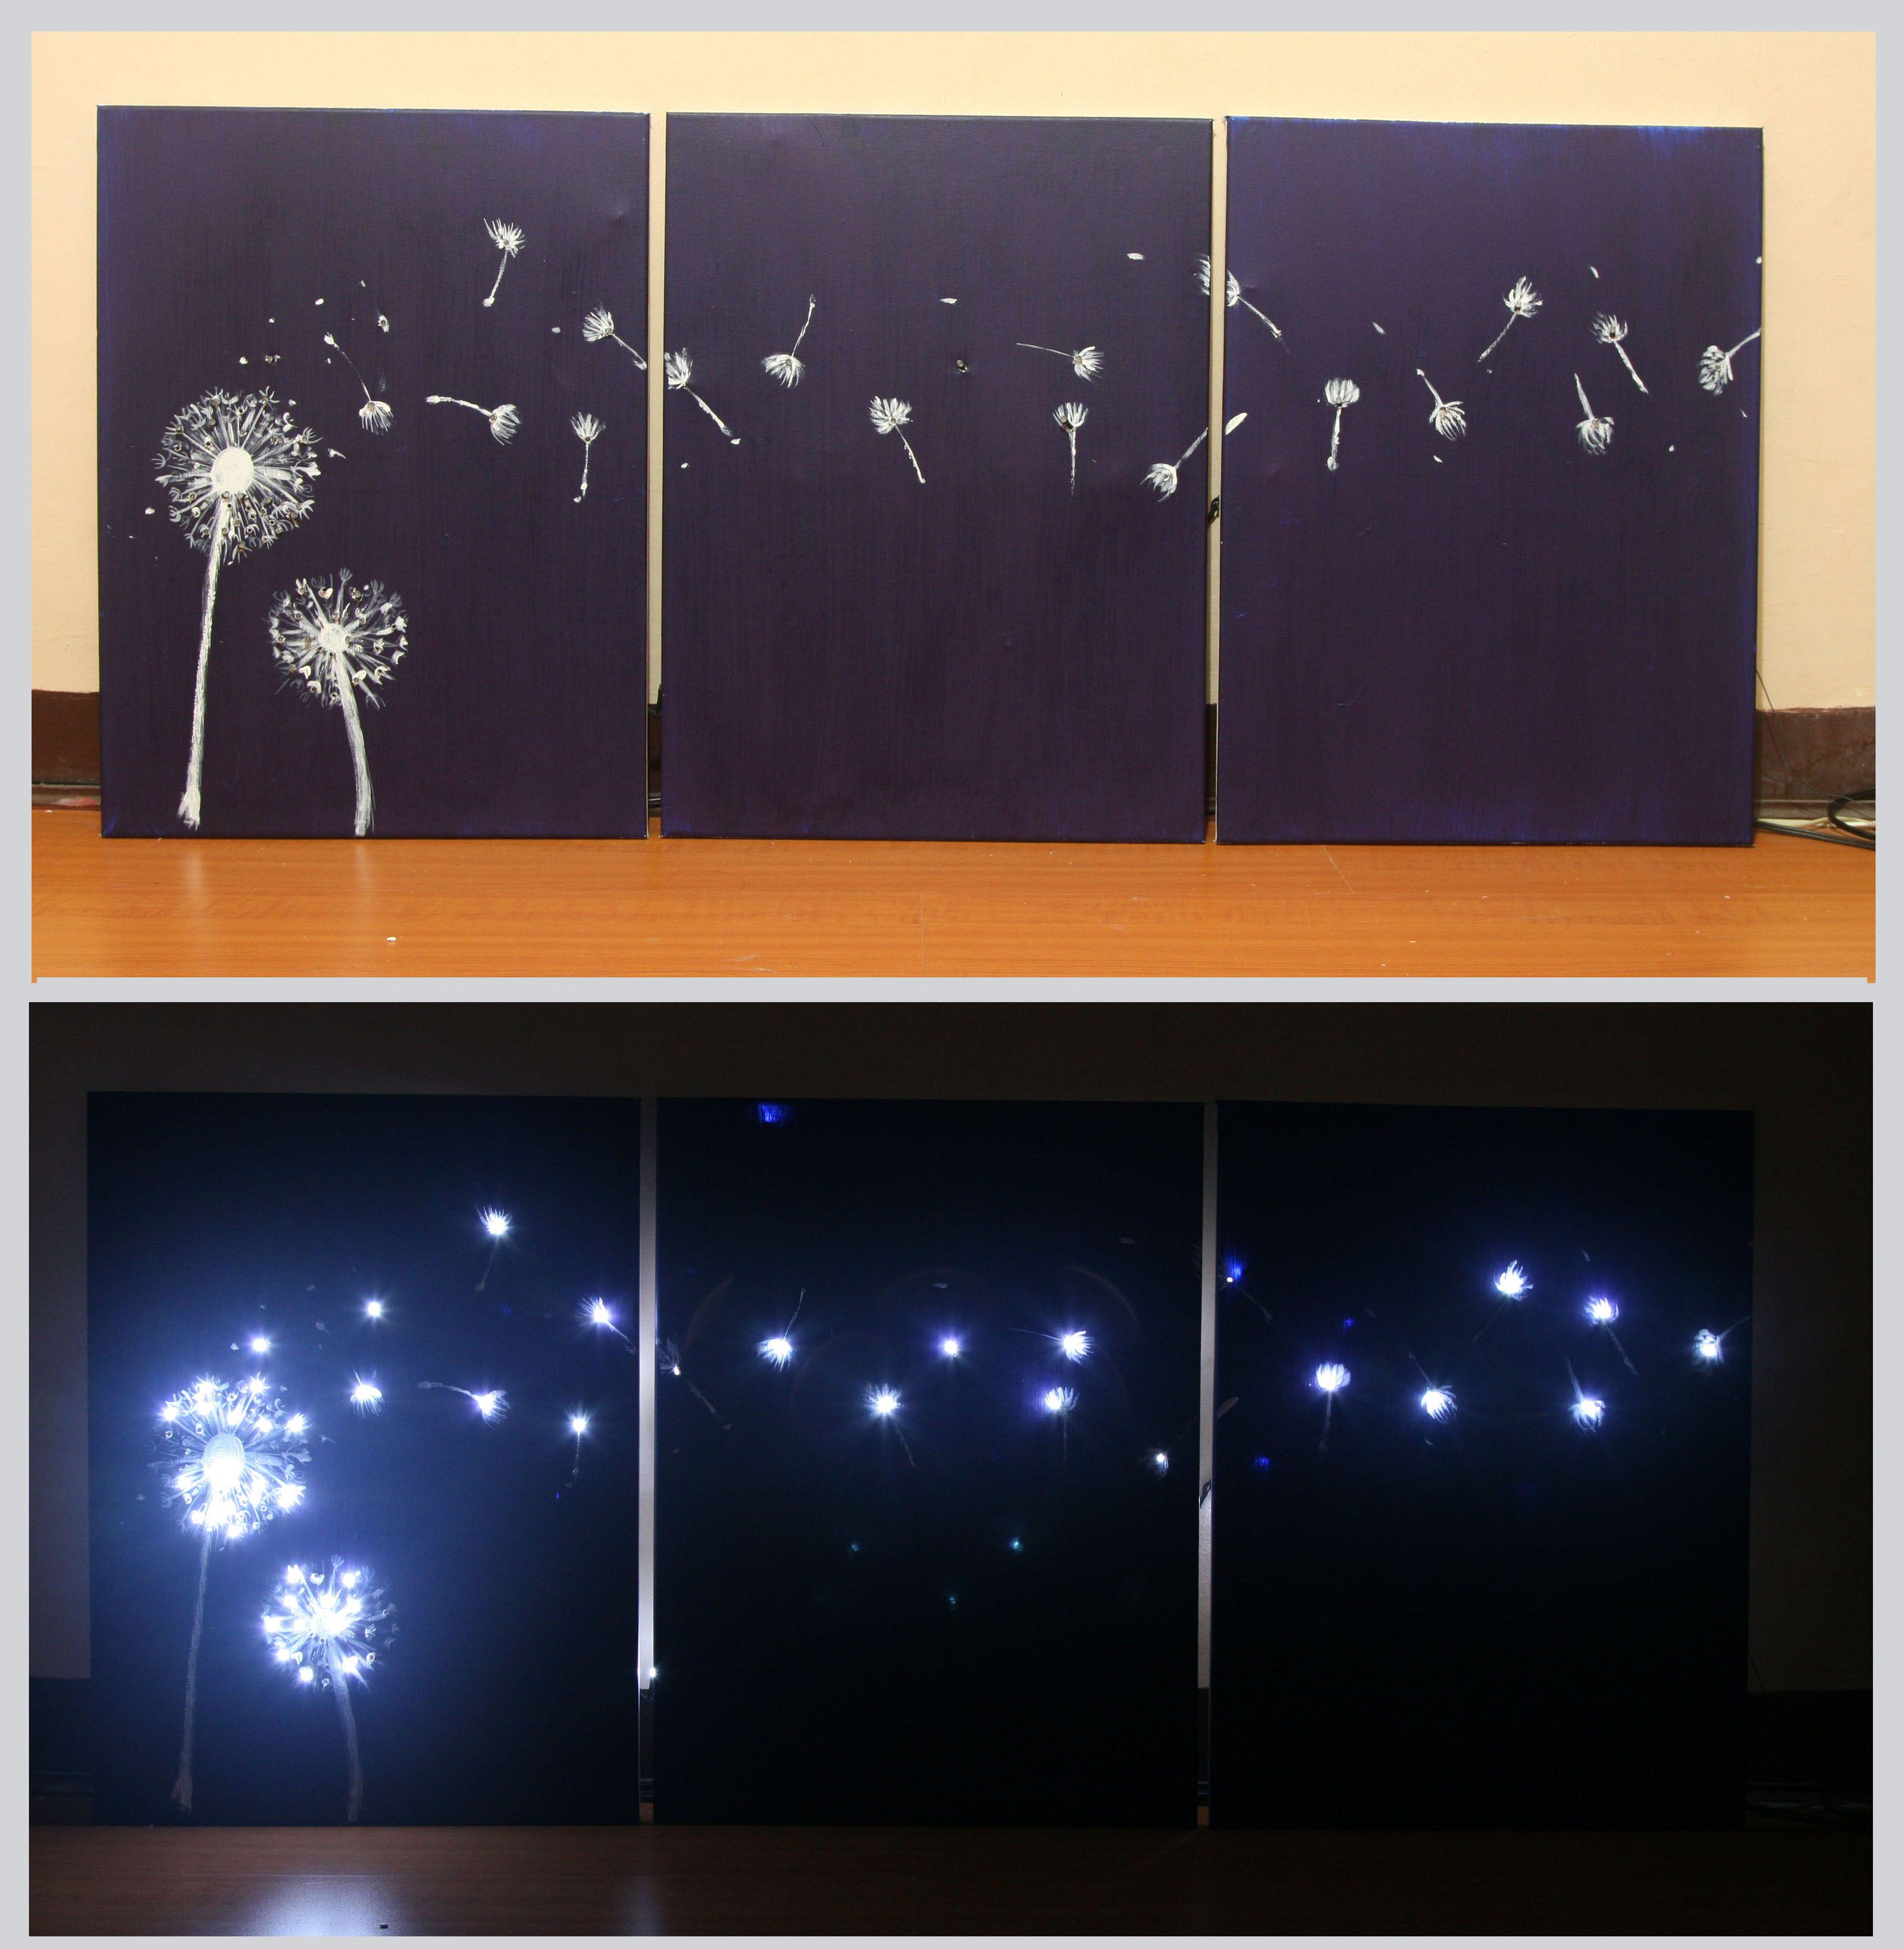 How to Design Three Panel, Light Up Dandelion Wall Art